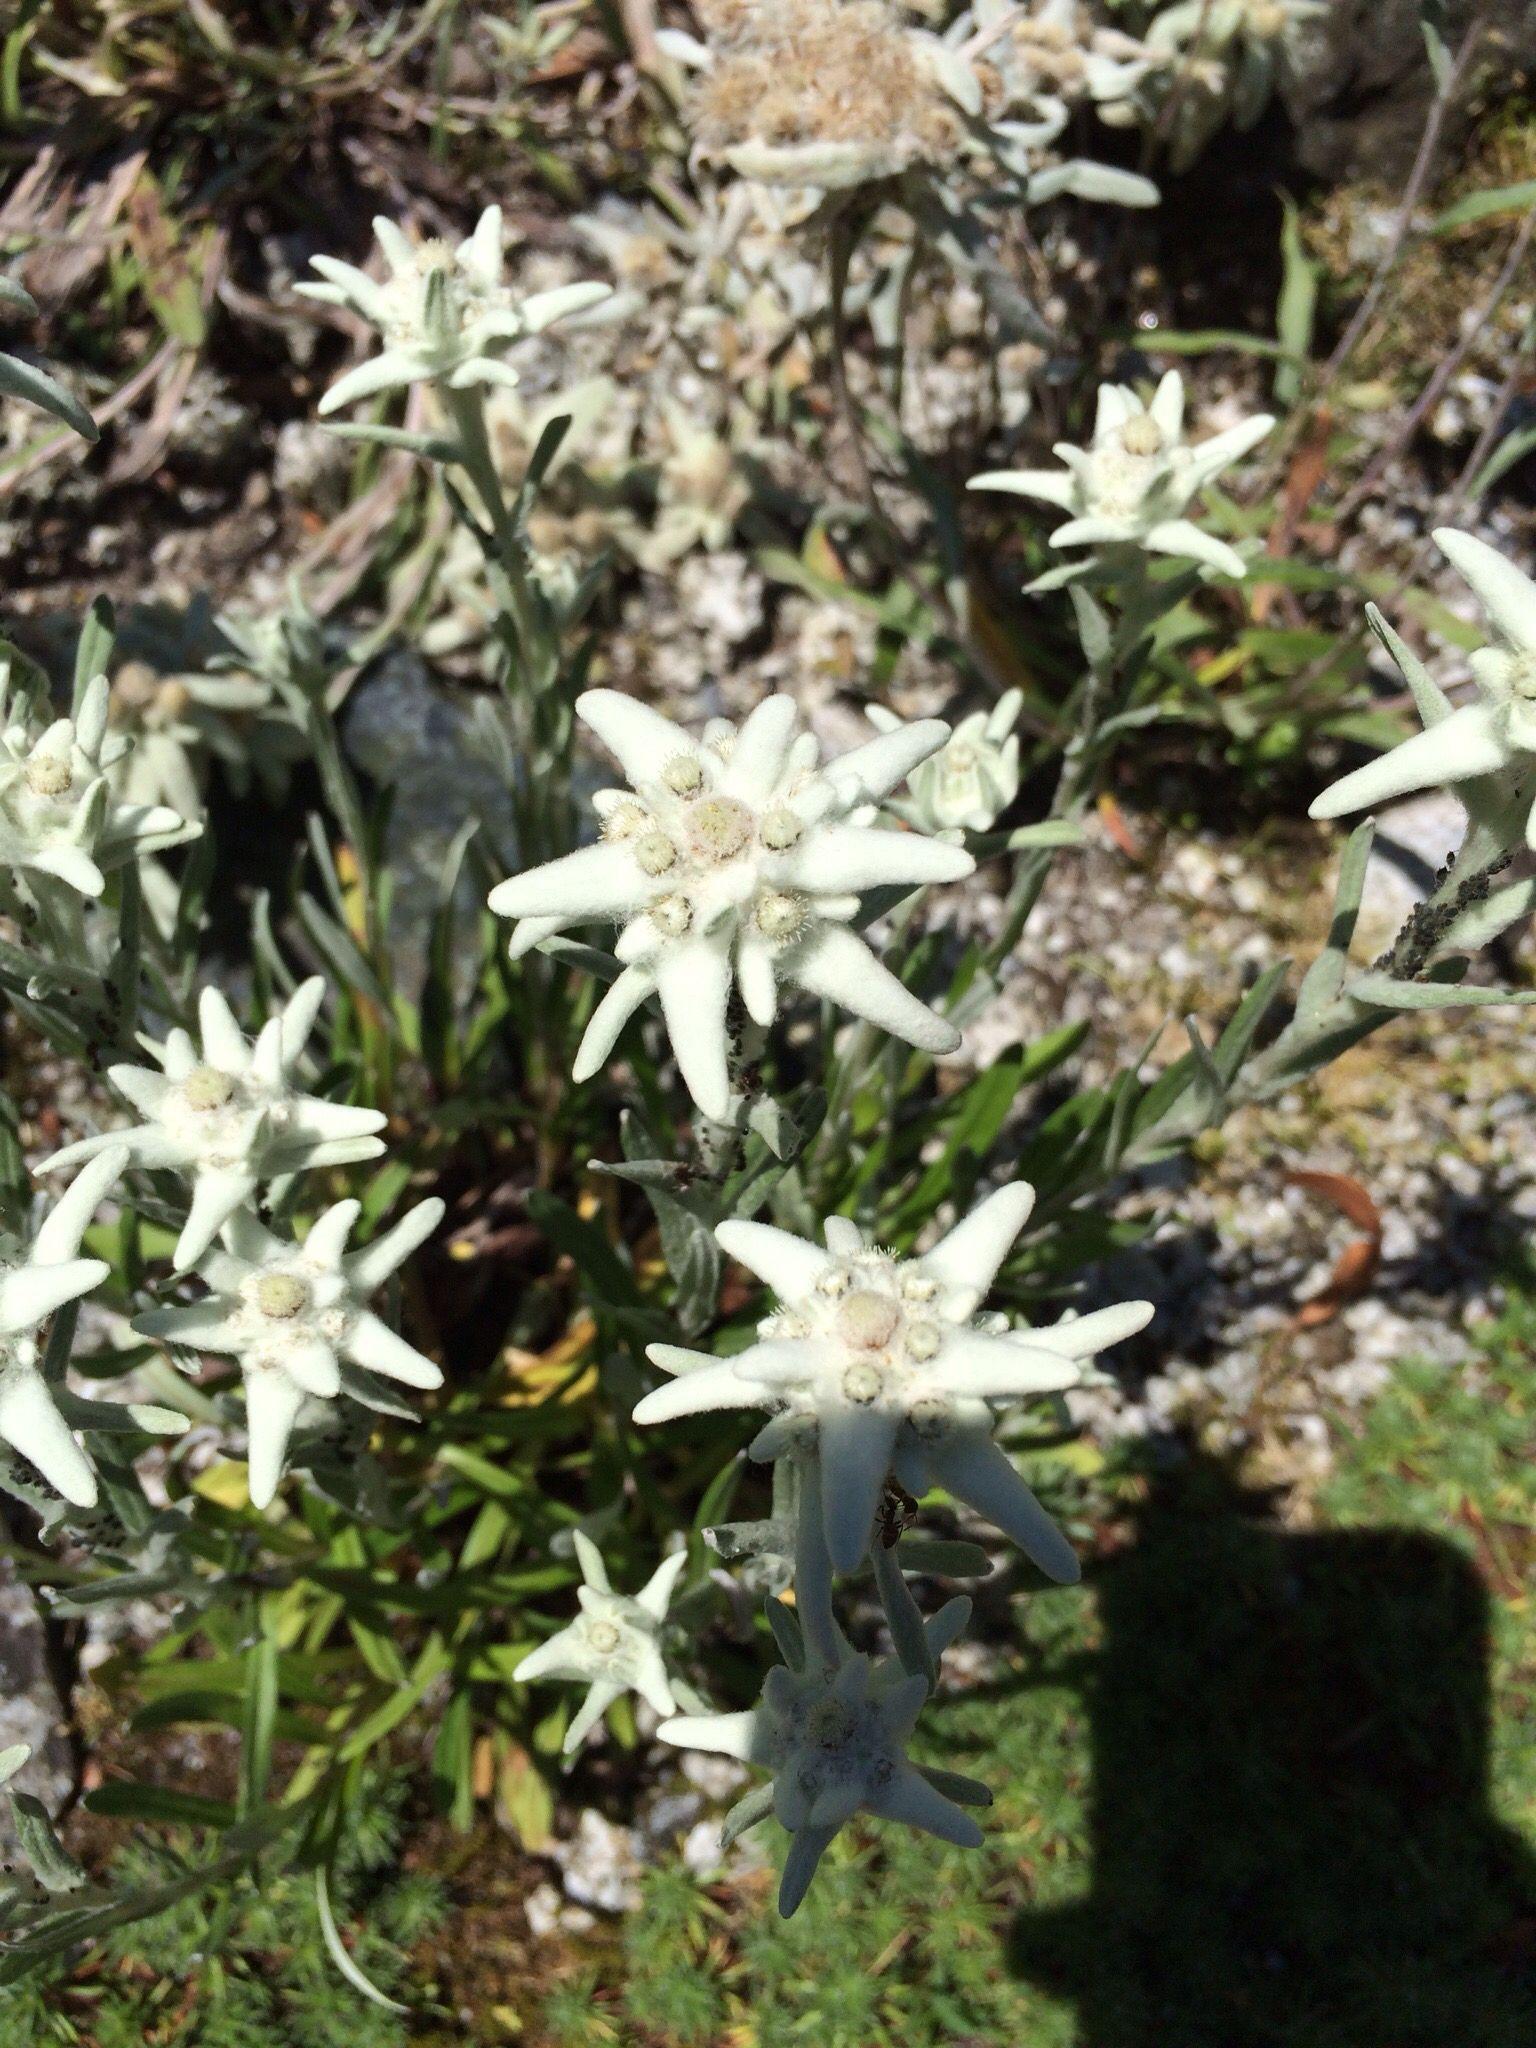 My favorite alpine flower. Photo by Sonja